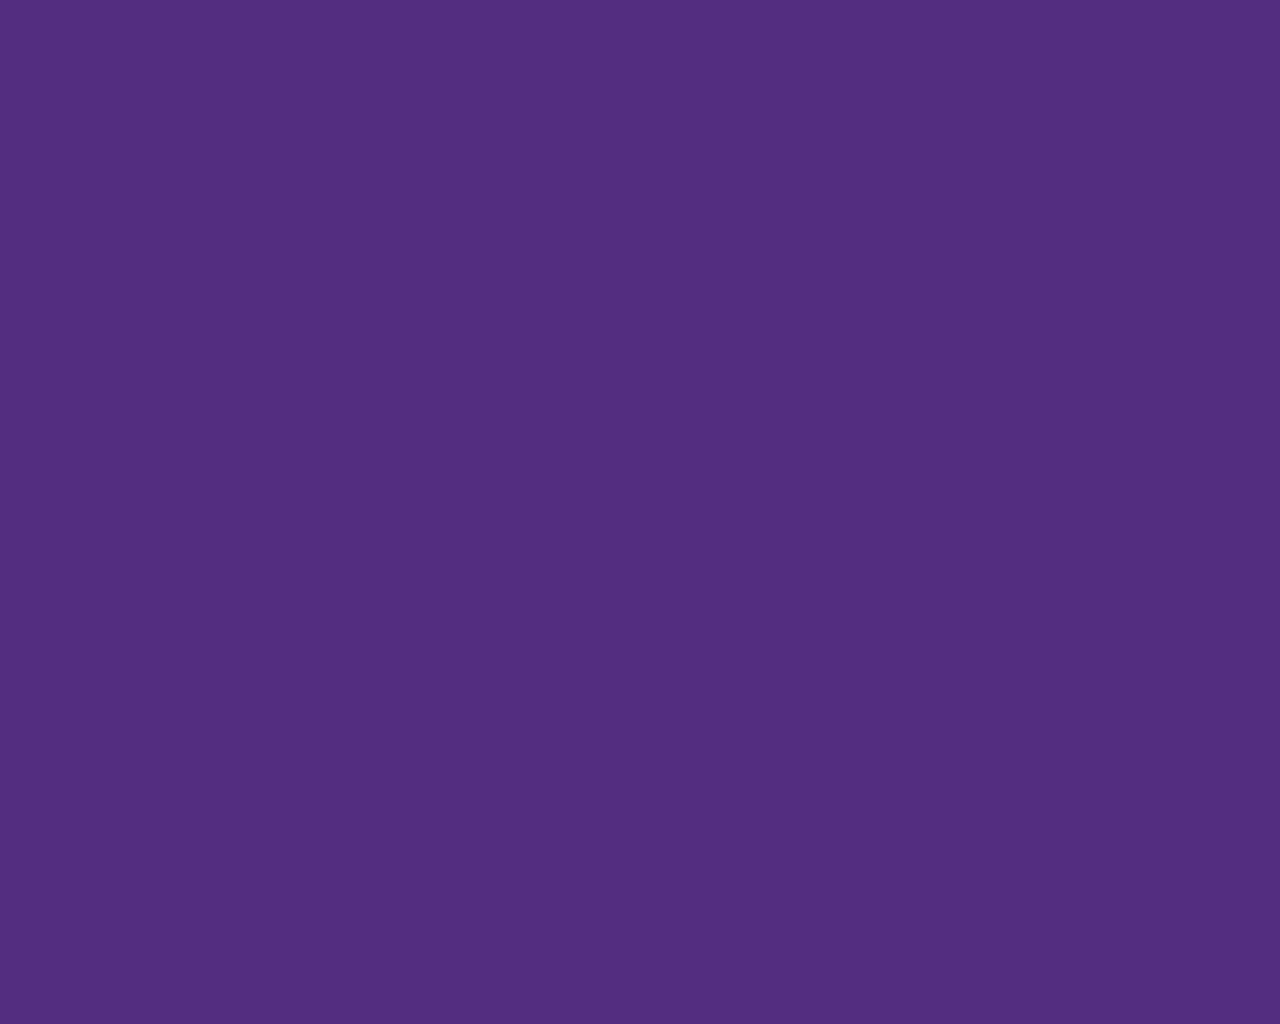 1280x1024 Regalia Solid Color Background